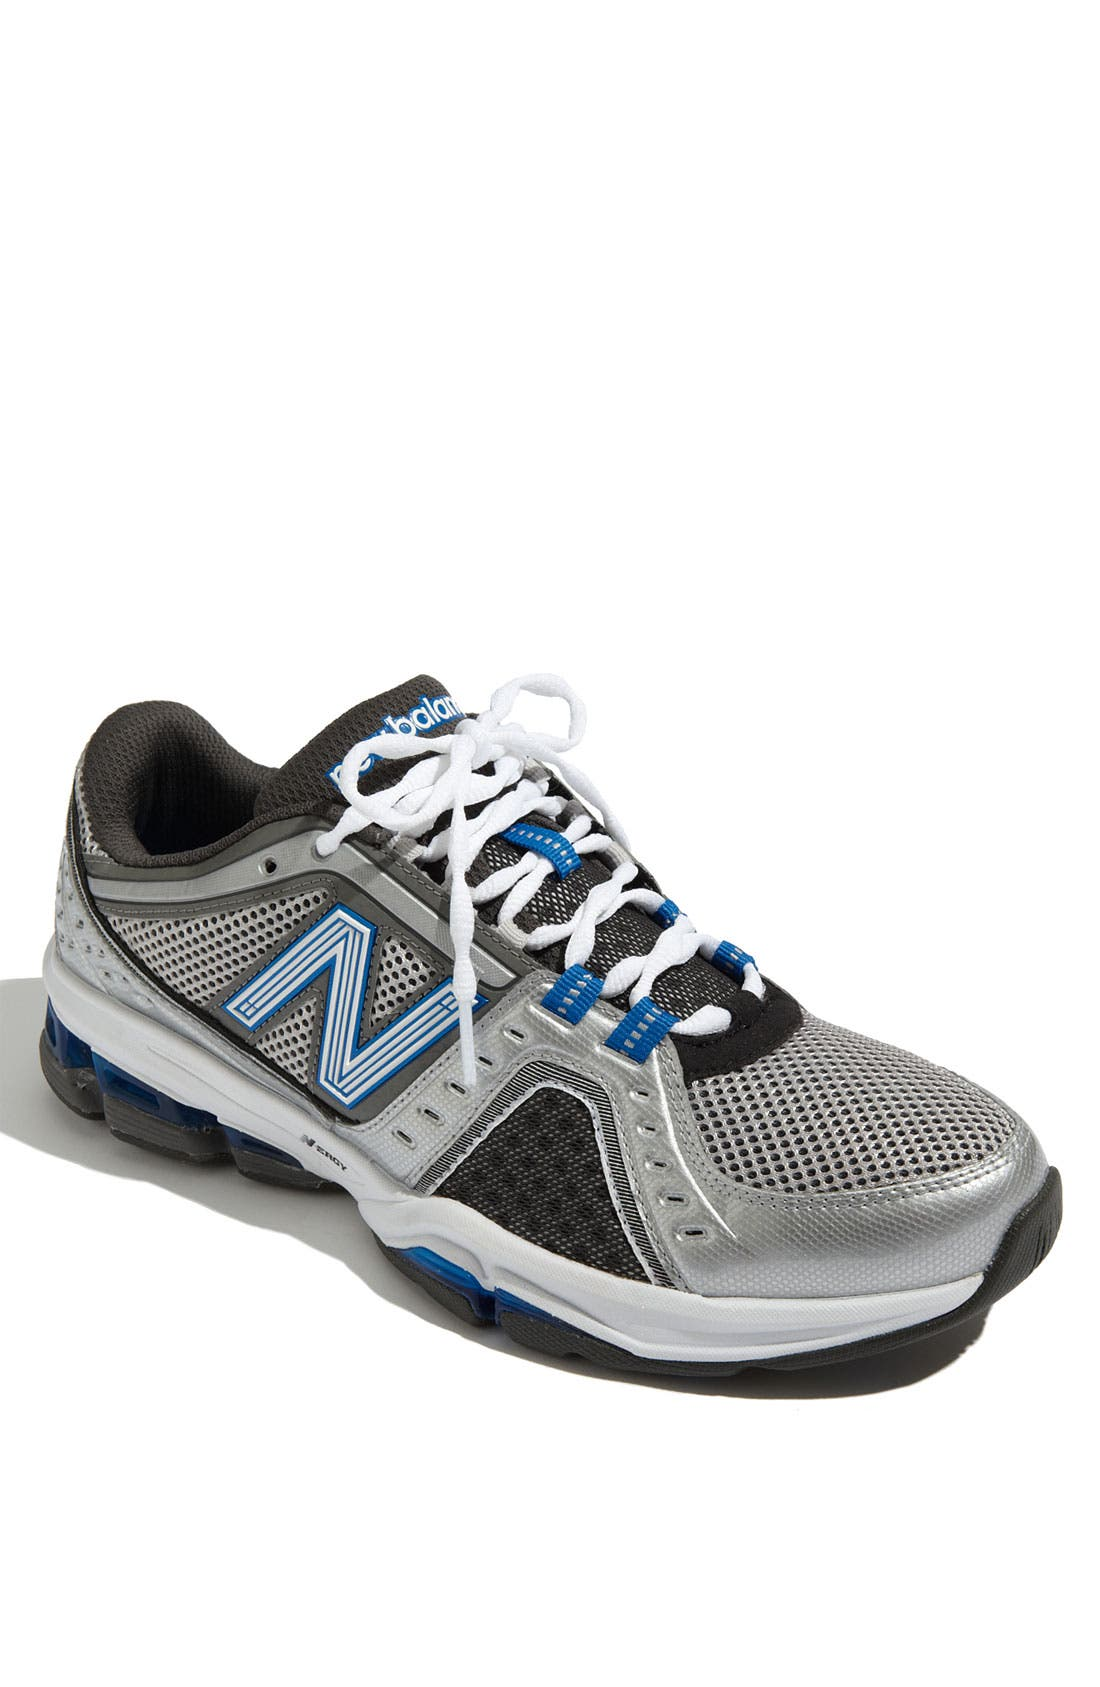 Main Image - New Balance '1211' Training Shoe (Men) (Online Only)